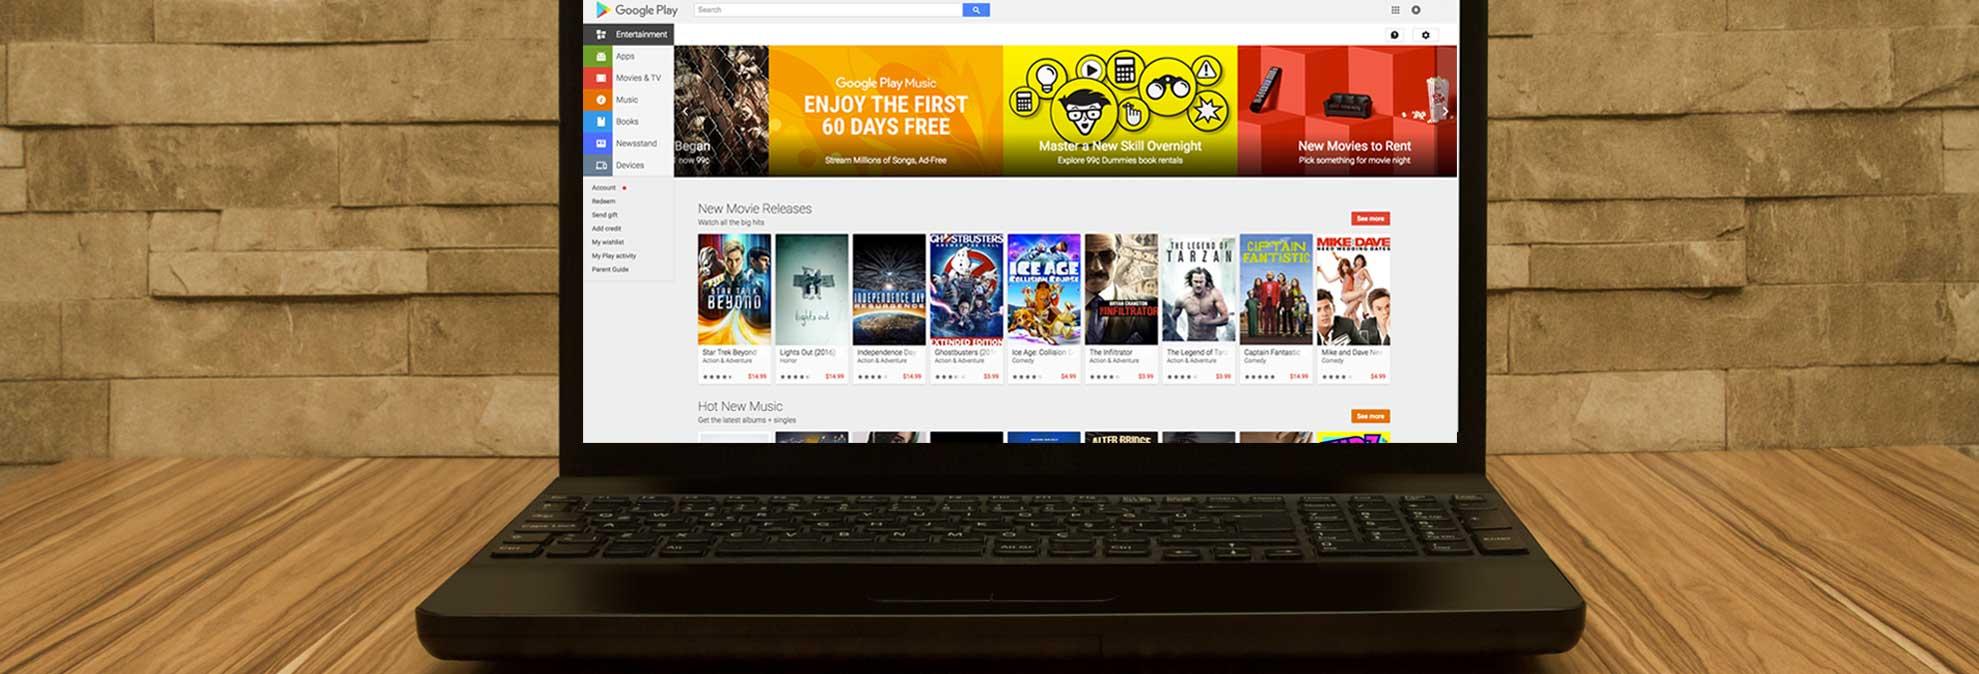 0df3aec41e0 Google Play Store Access for Chromebook - Consumer Reports